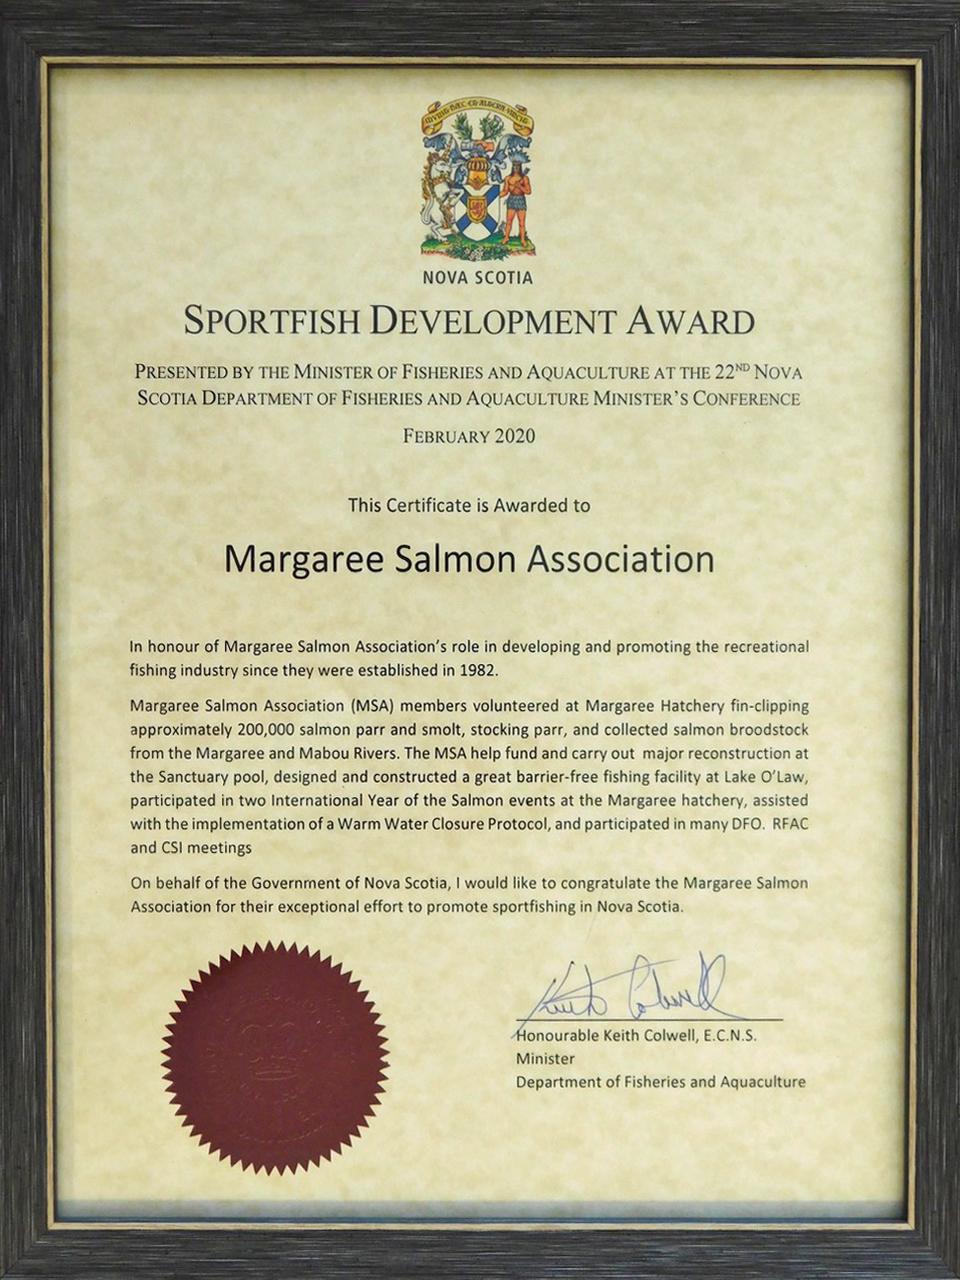 Sportfish Development Award presented to the MSA